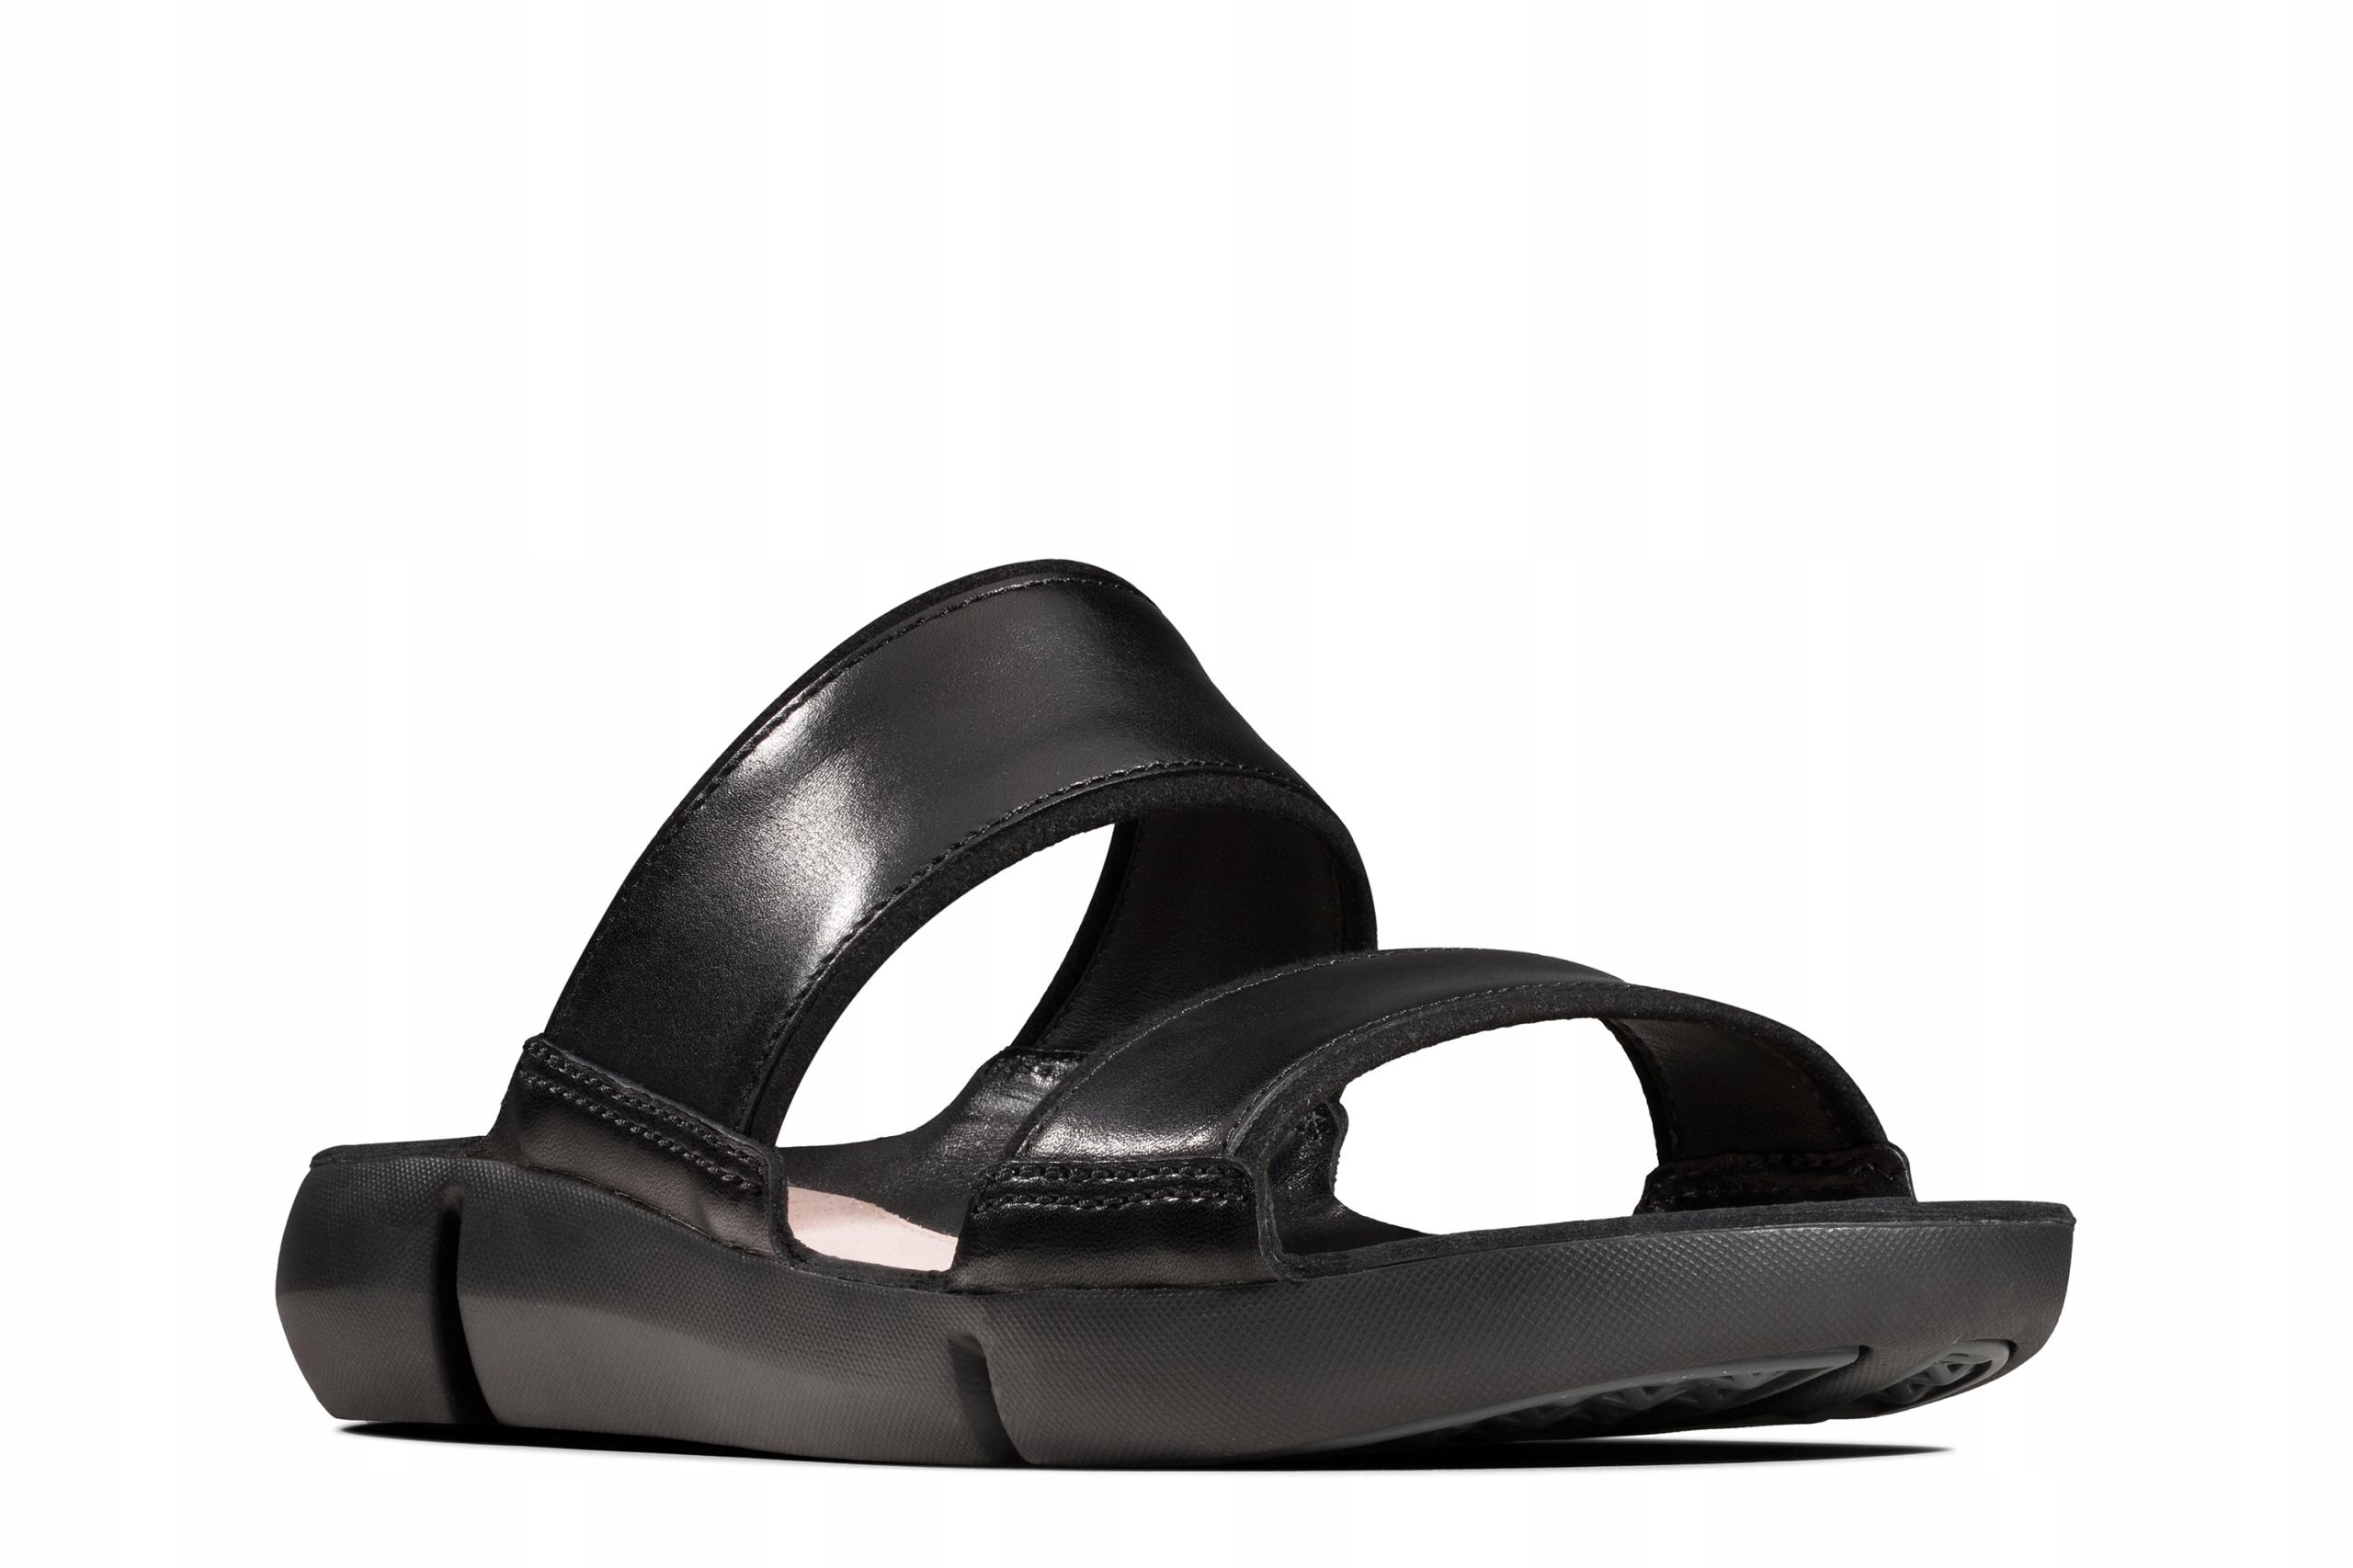 KLAPKI CLARKS TRI SARA Black Leather 38